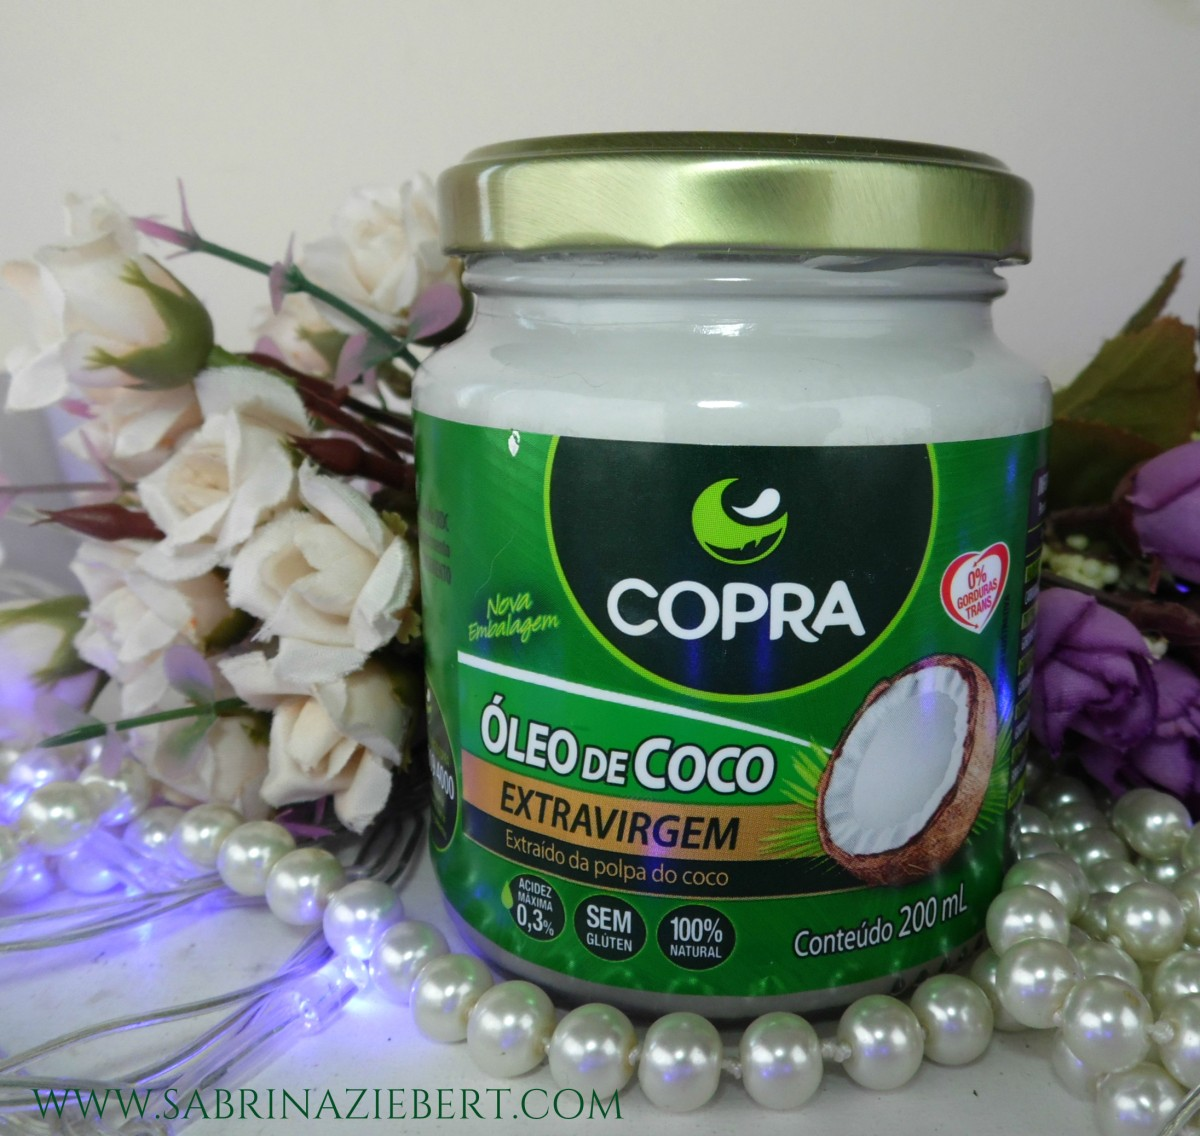 Resenha - Óleo de Coco Copra